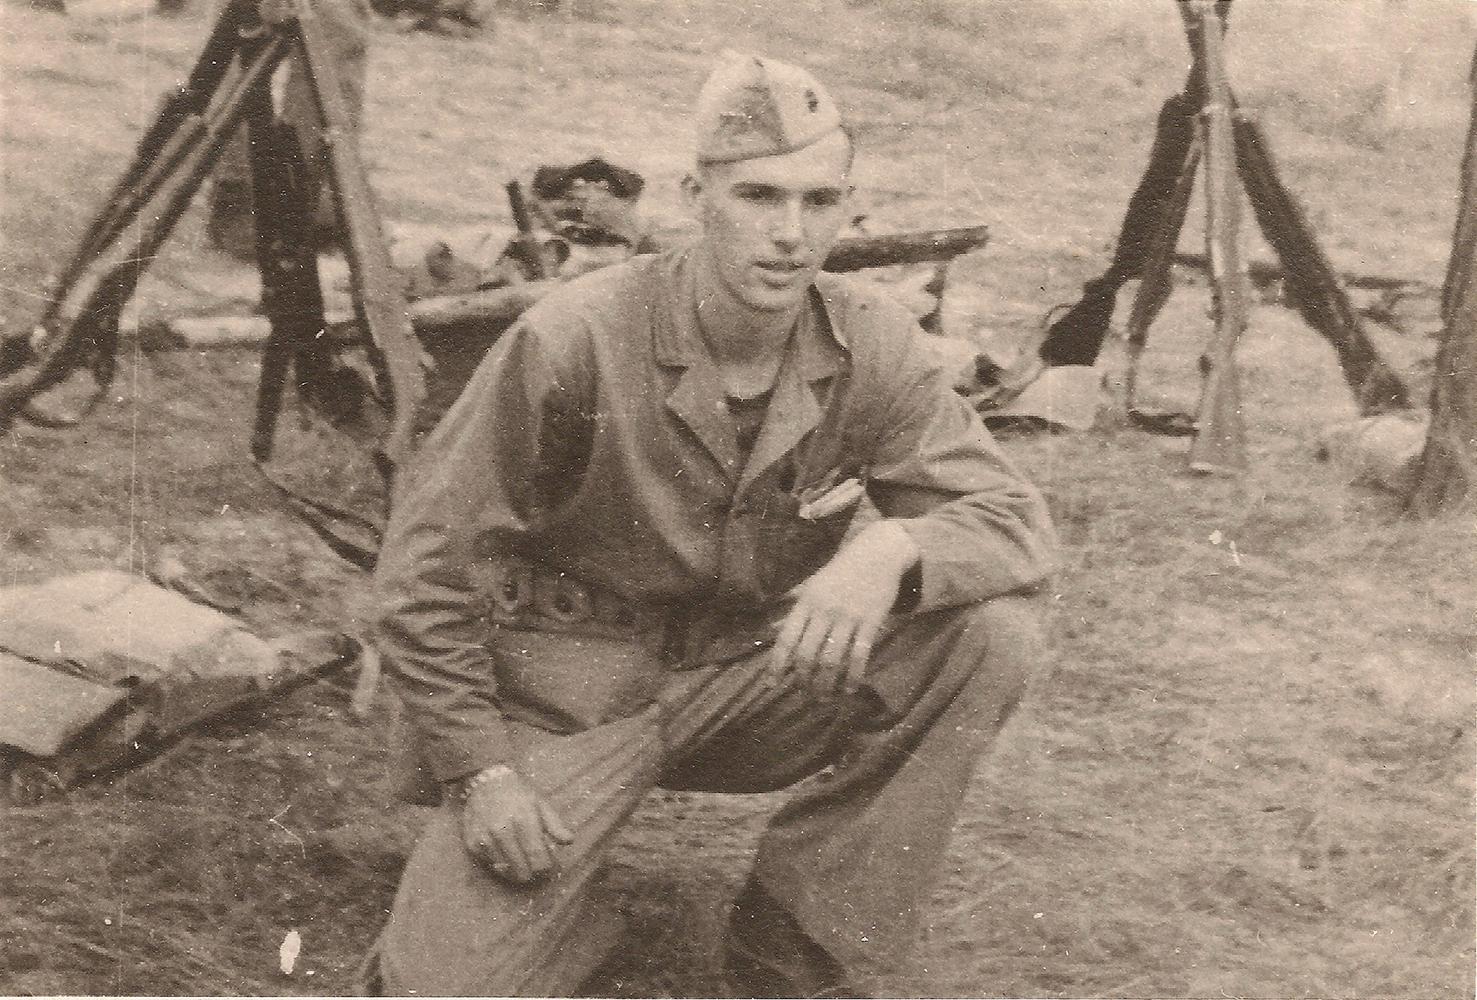 Second Lieutenant Wallace Hagedorn at Camp Lejeune